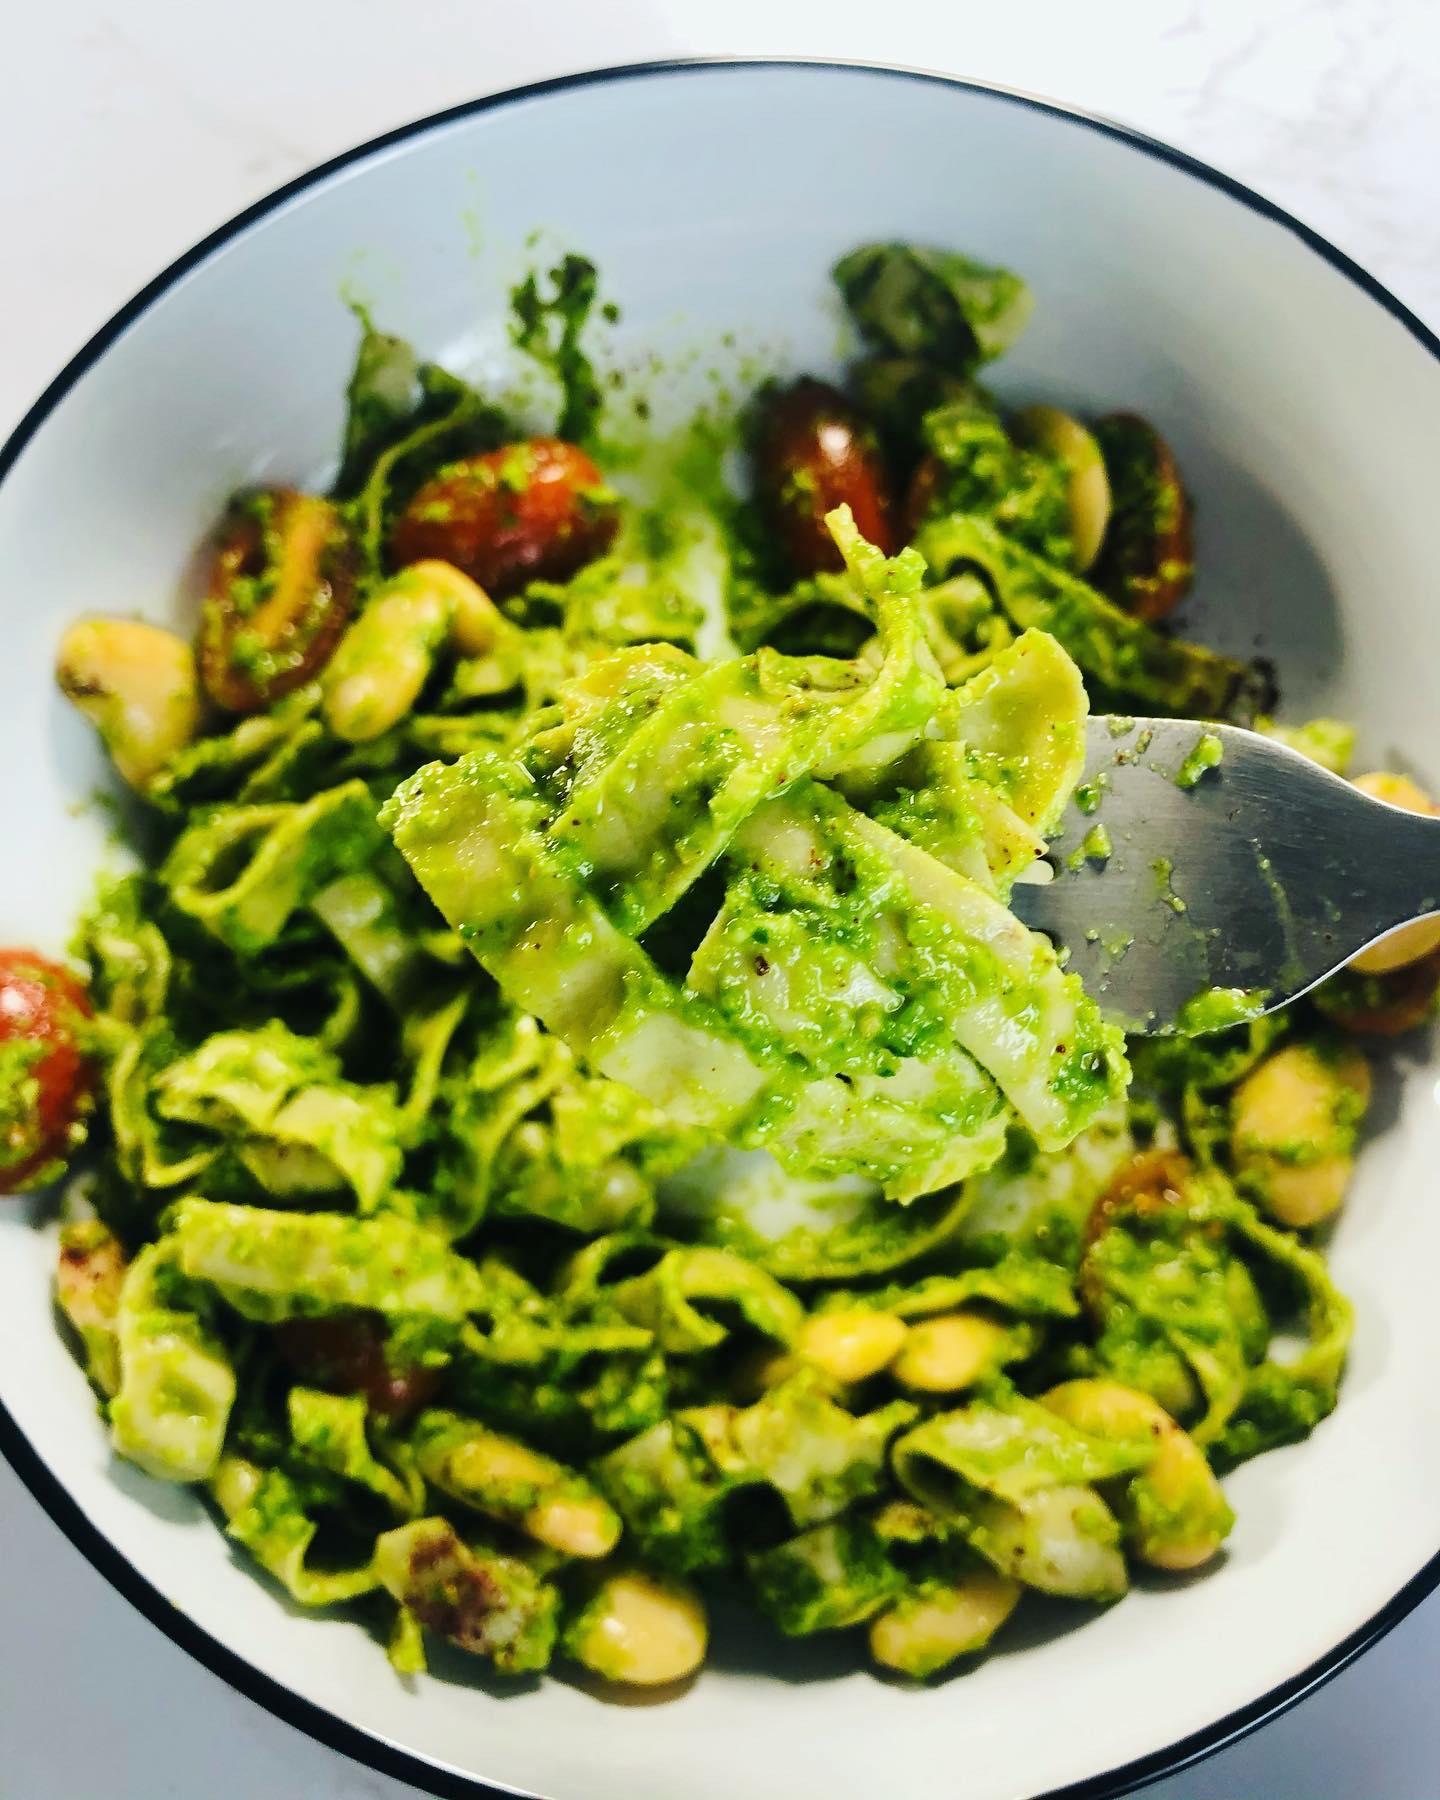 10-Minute Creamy Avocado & Lime Pasta